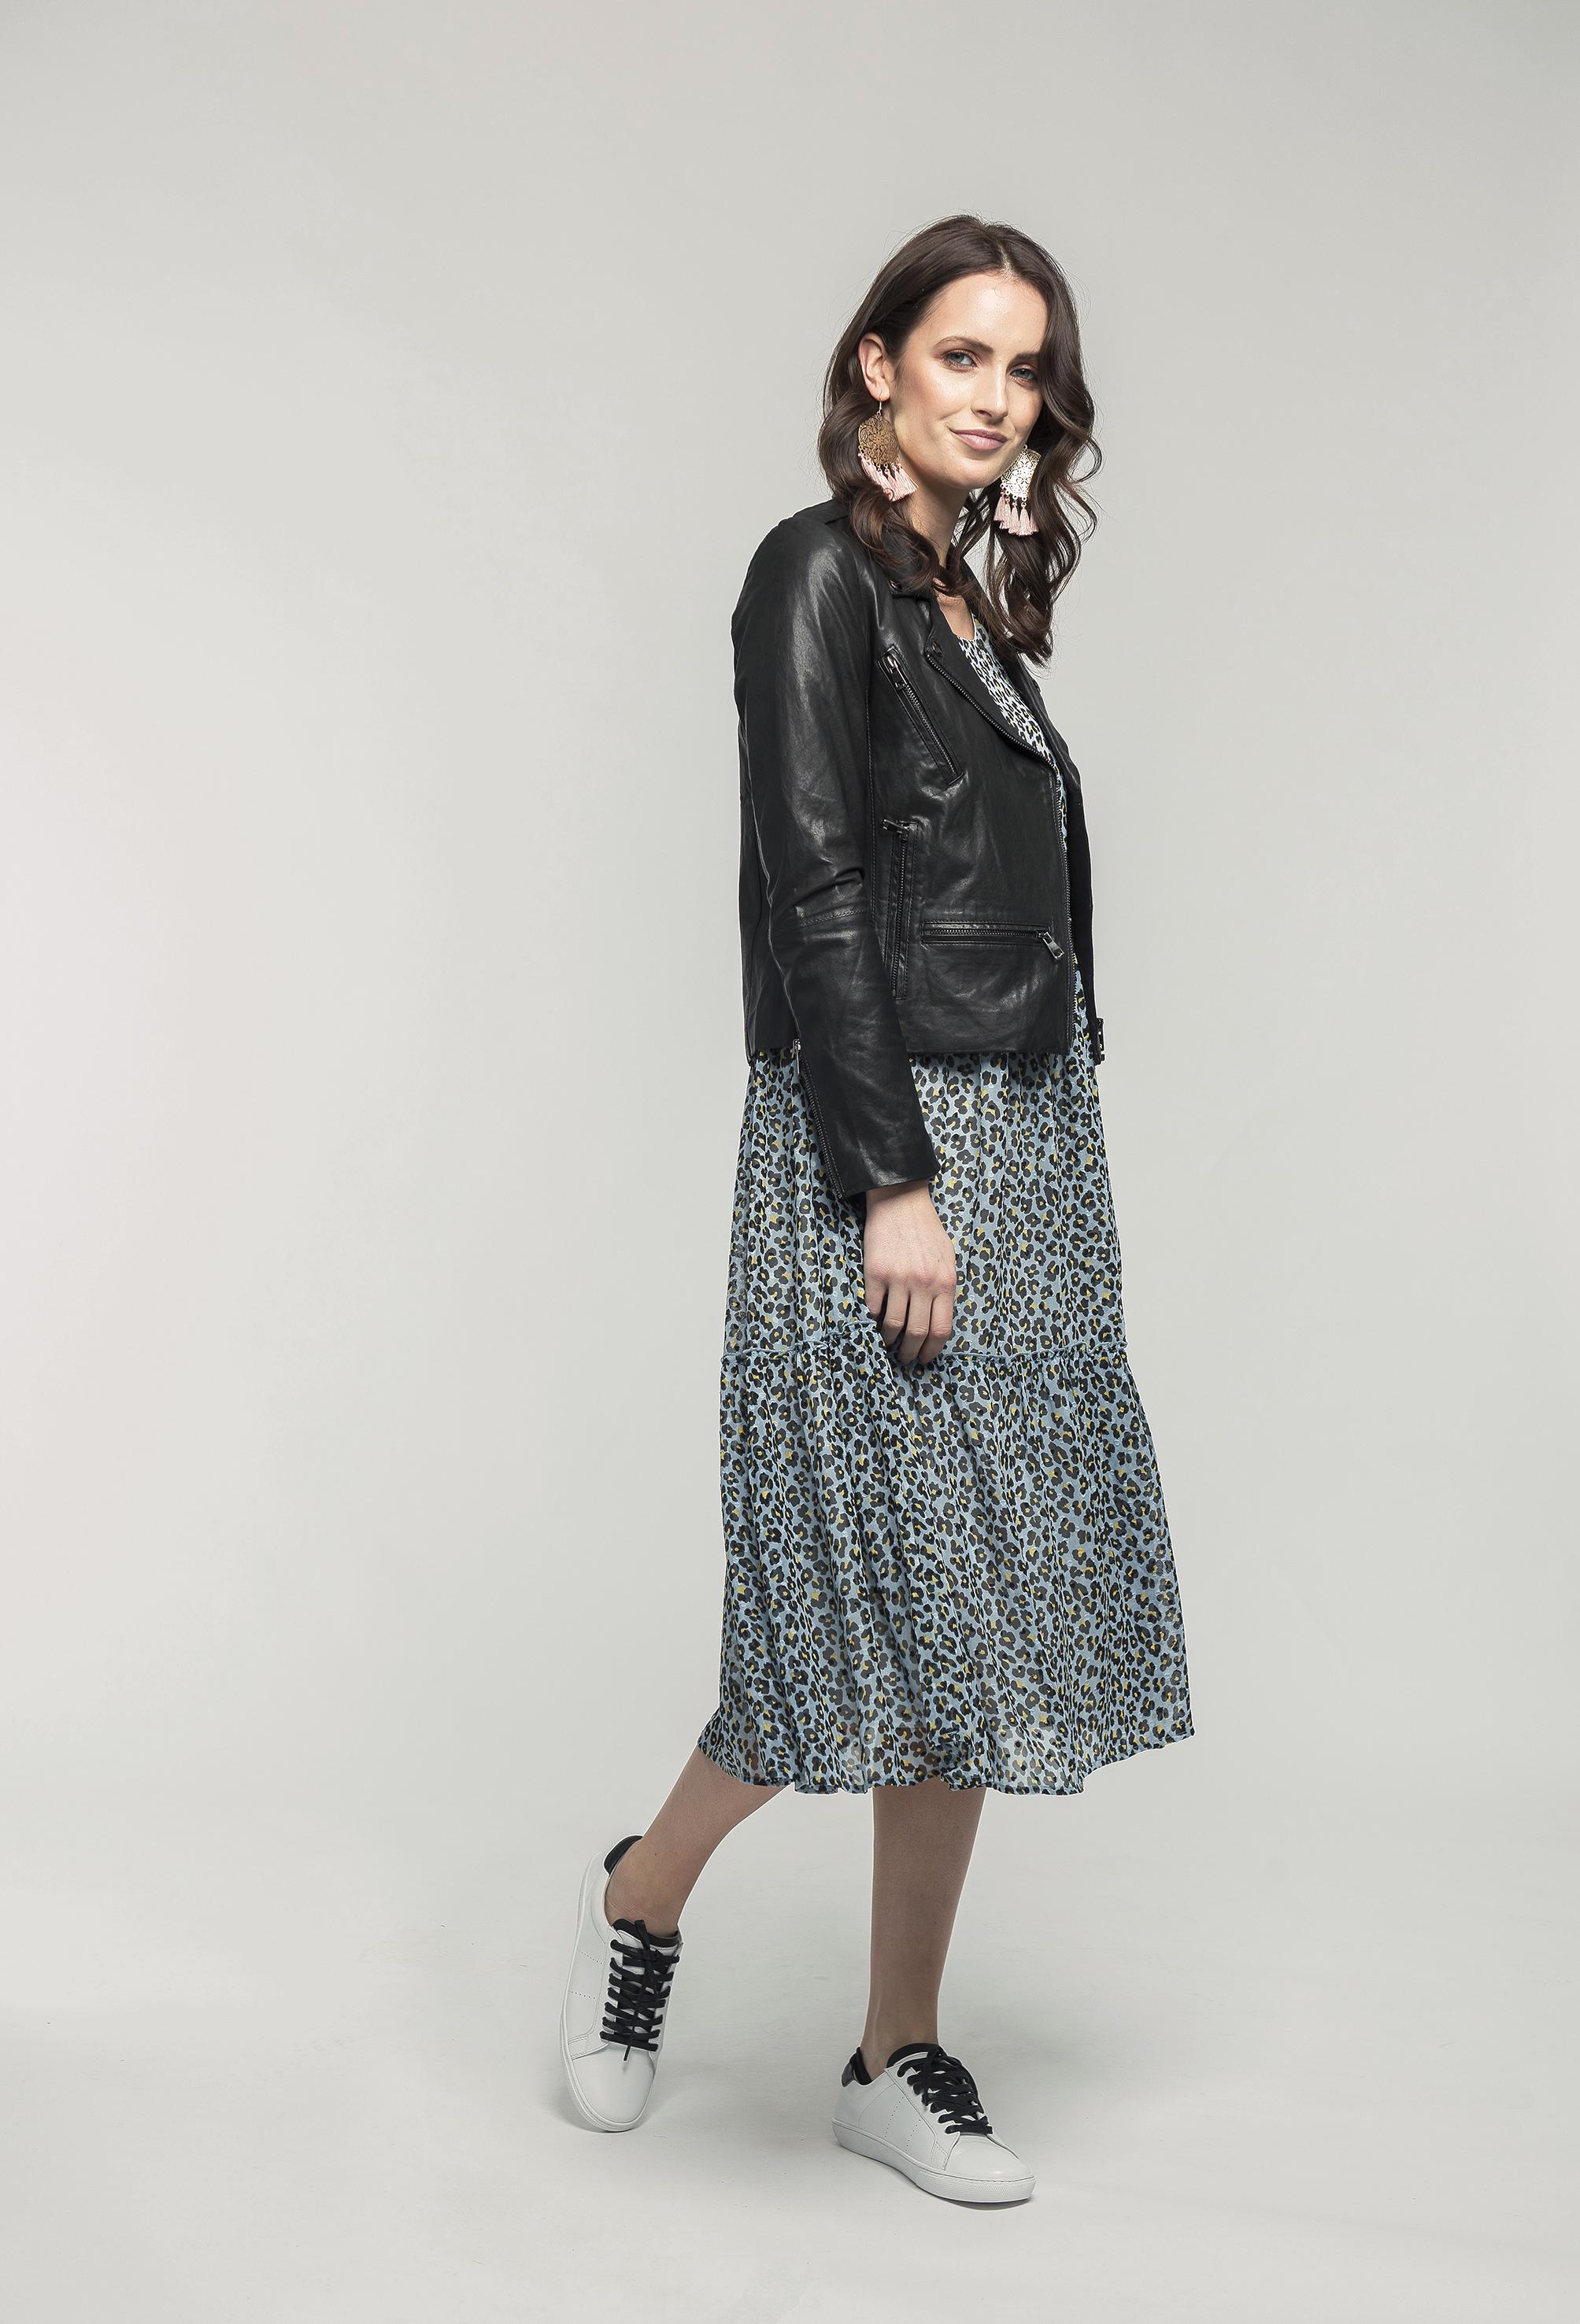 315 Leather Jacket - black & 259 Wendy Maxi - blue leo  (2).jpg